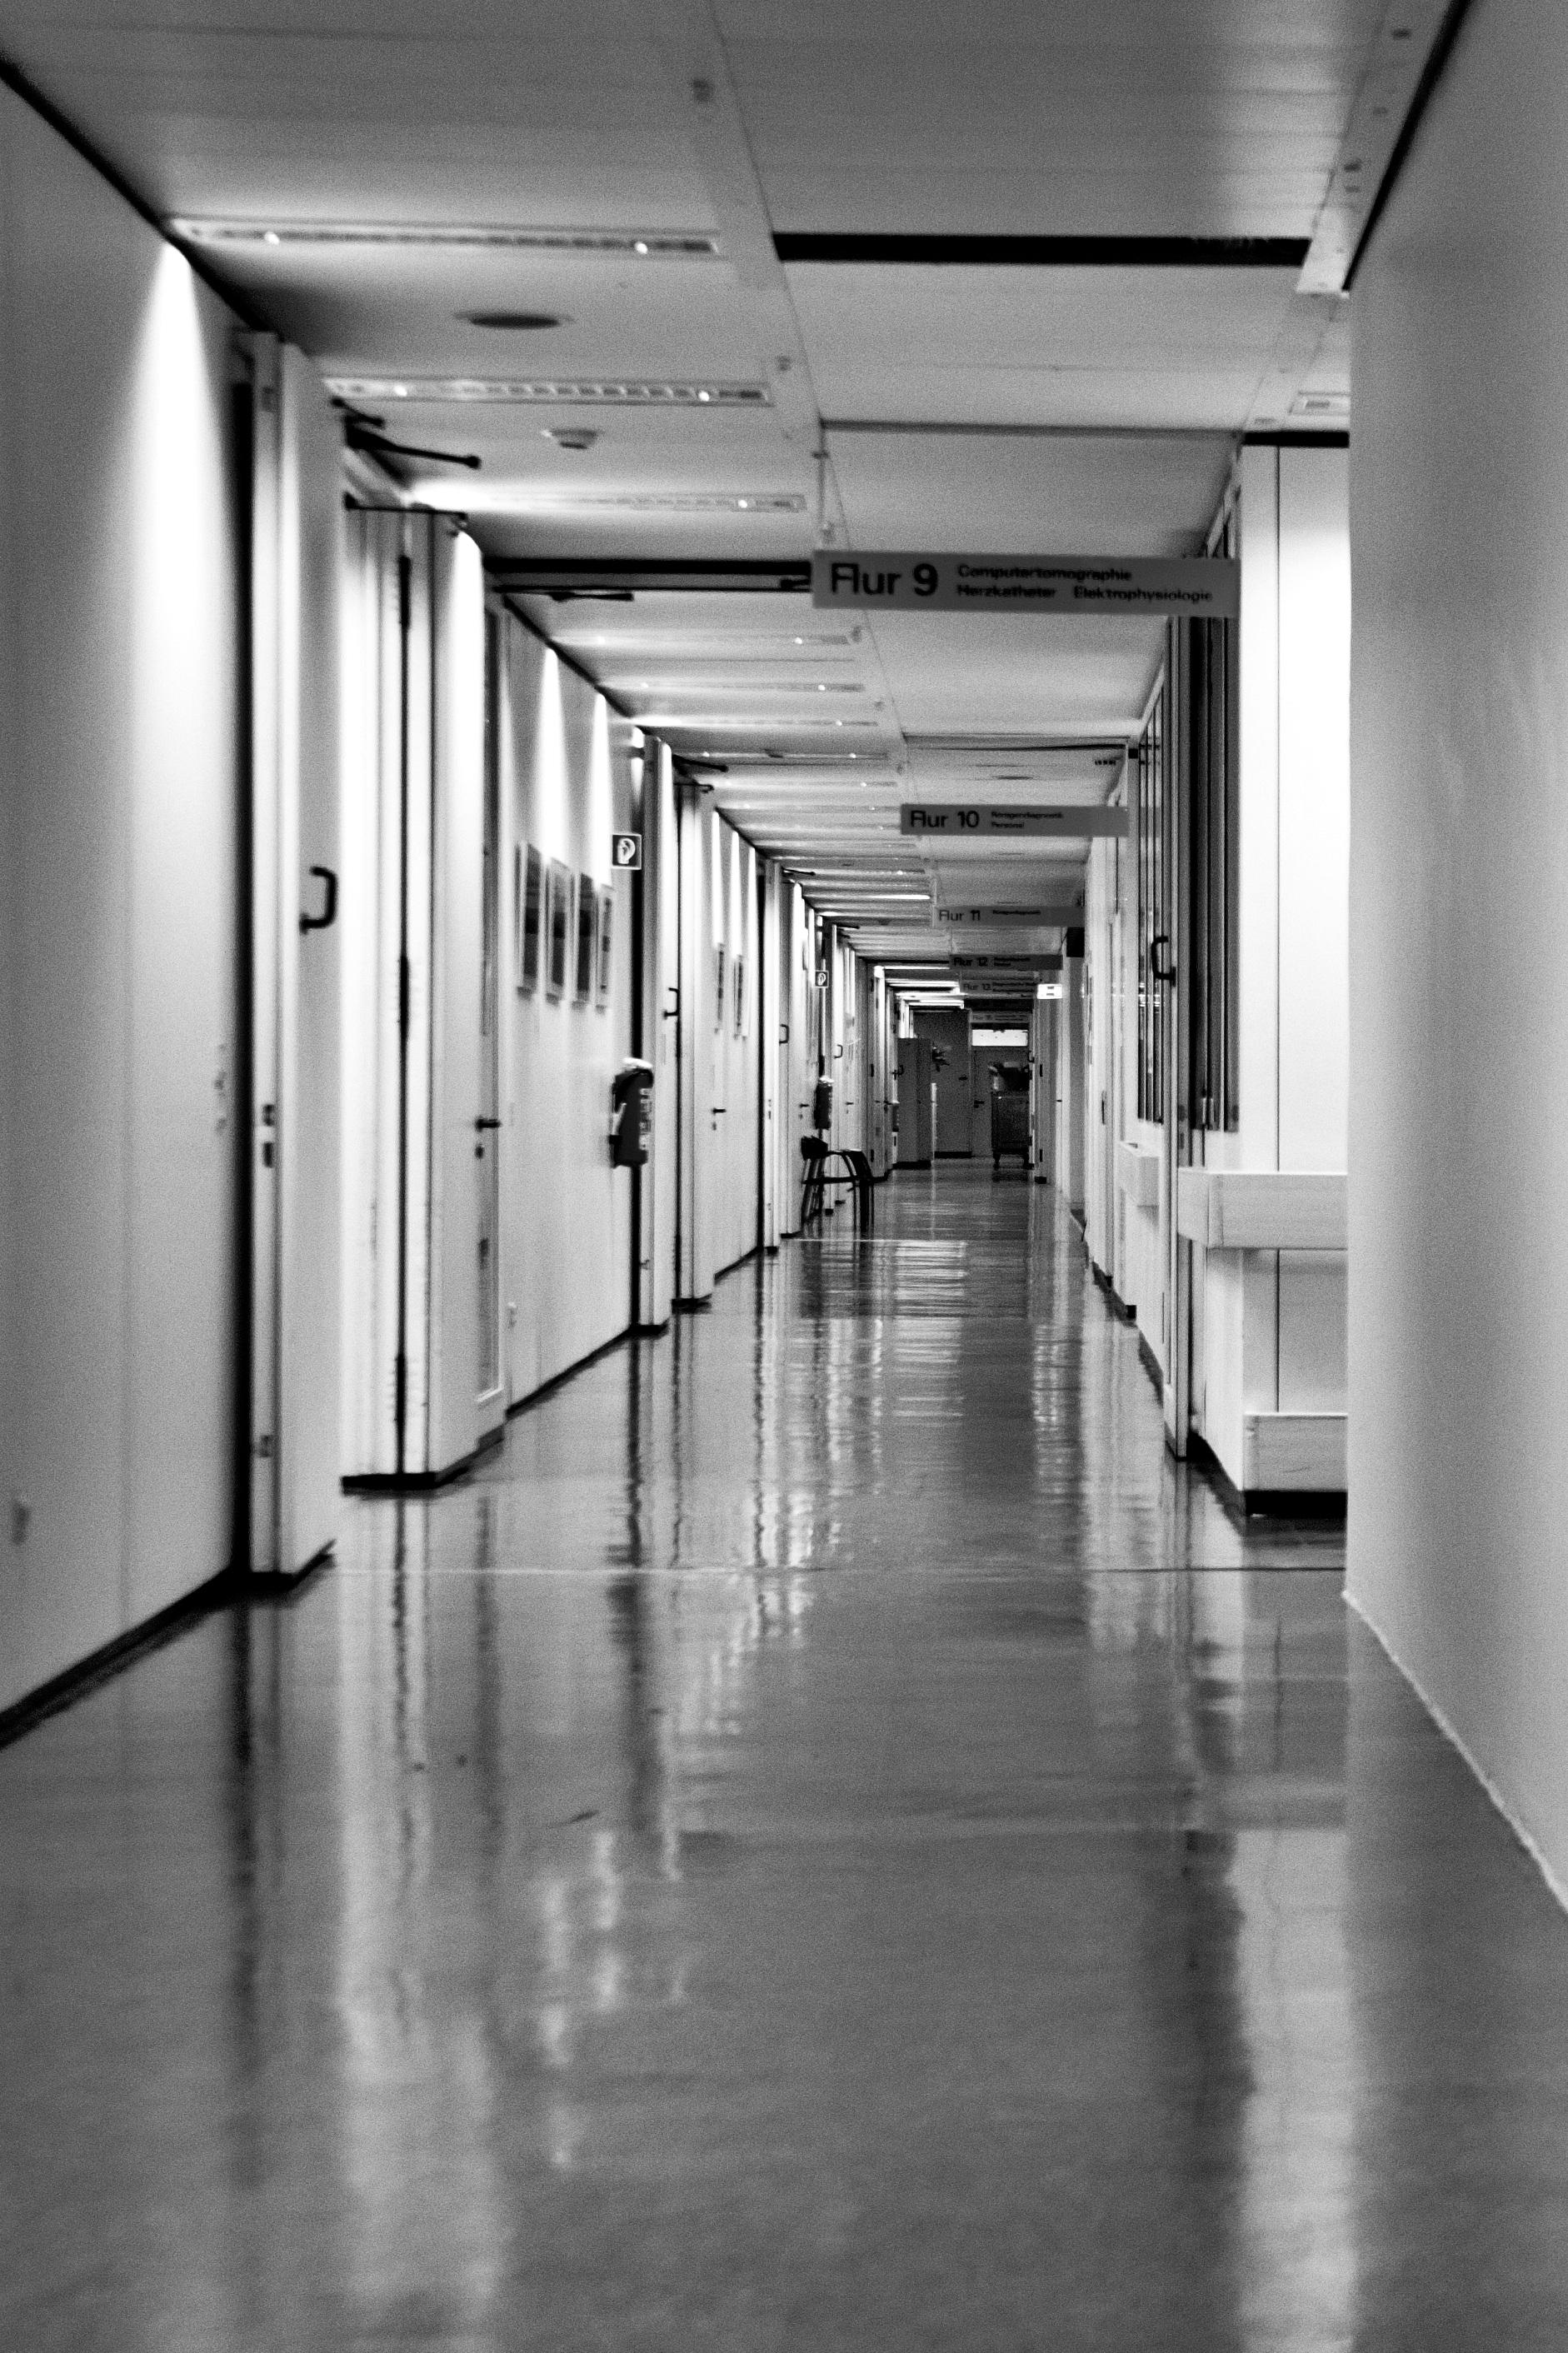 Hospital Corridor Lighting Design: Free Images : Light, Black And White, Architecture